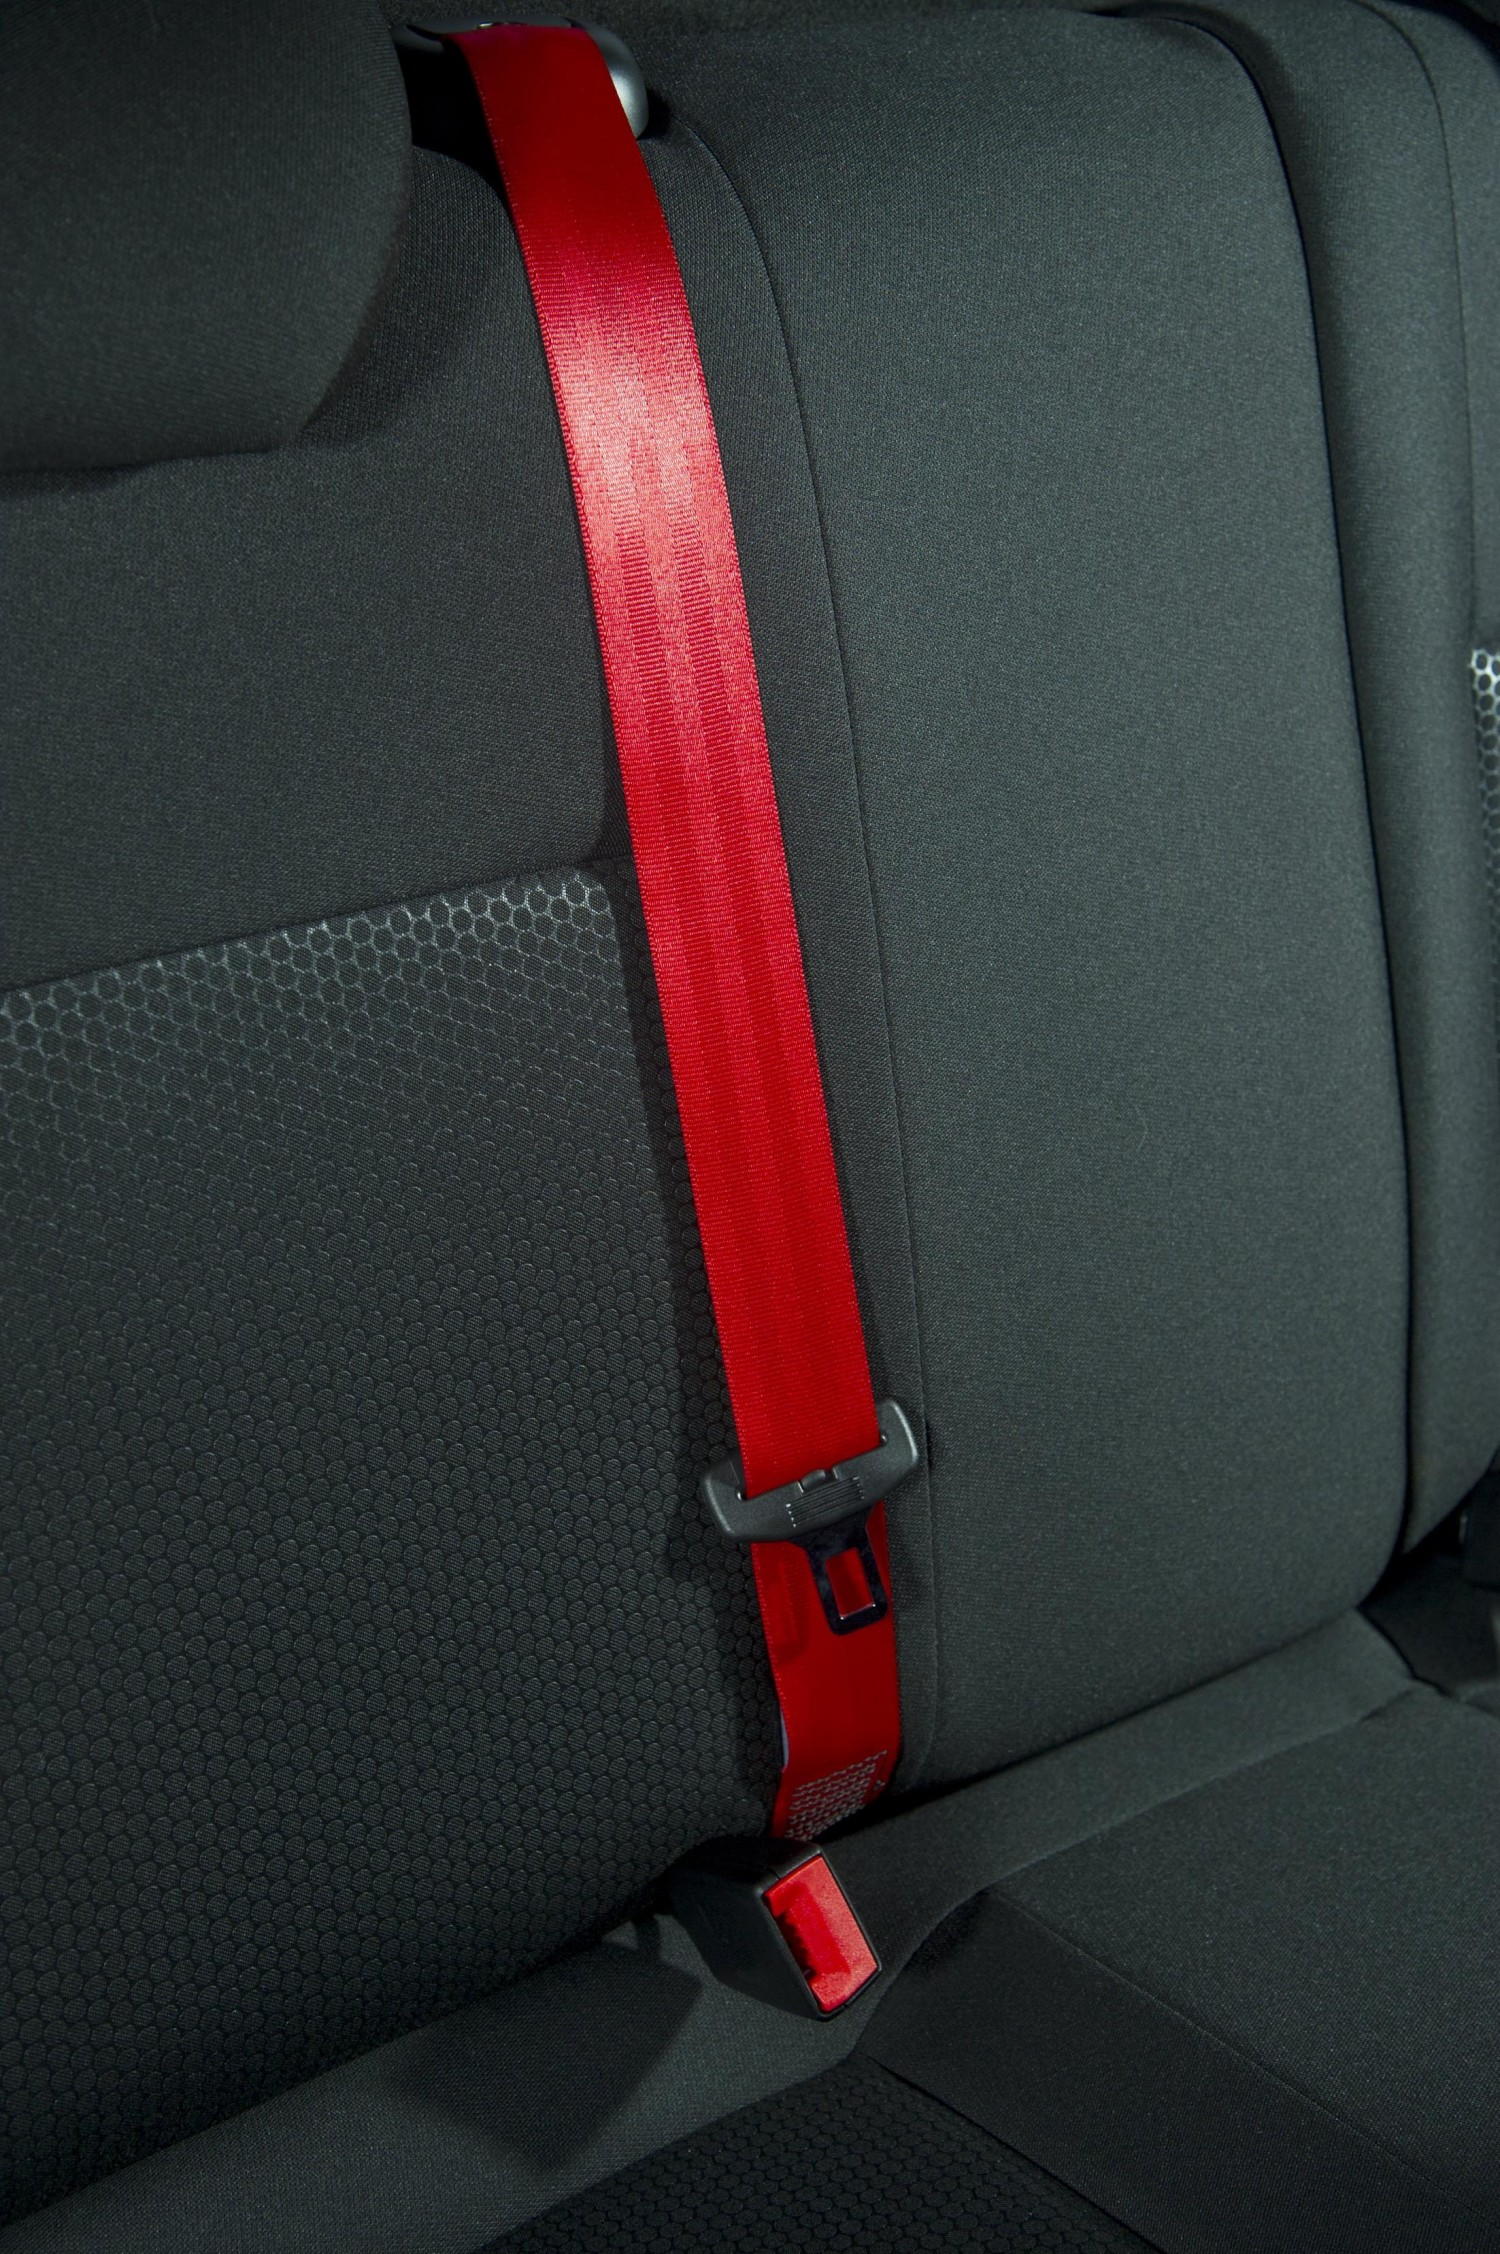 SEAT Ibiza FR Red Edition 1 2 TSI | Eurekar